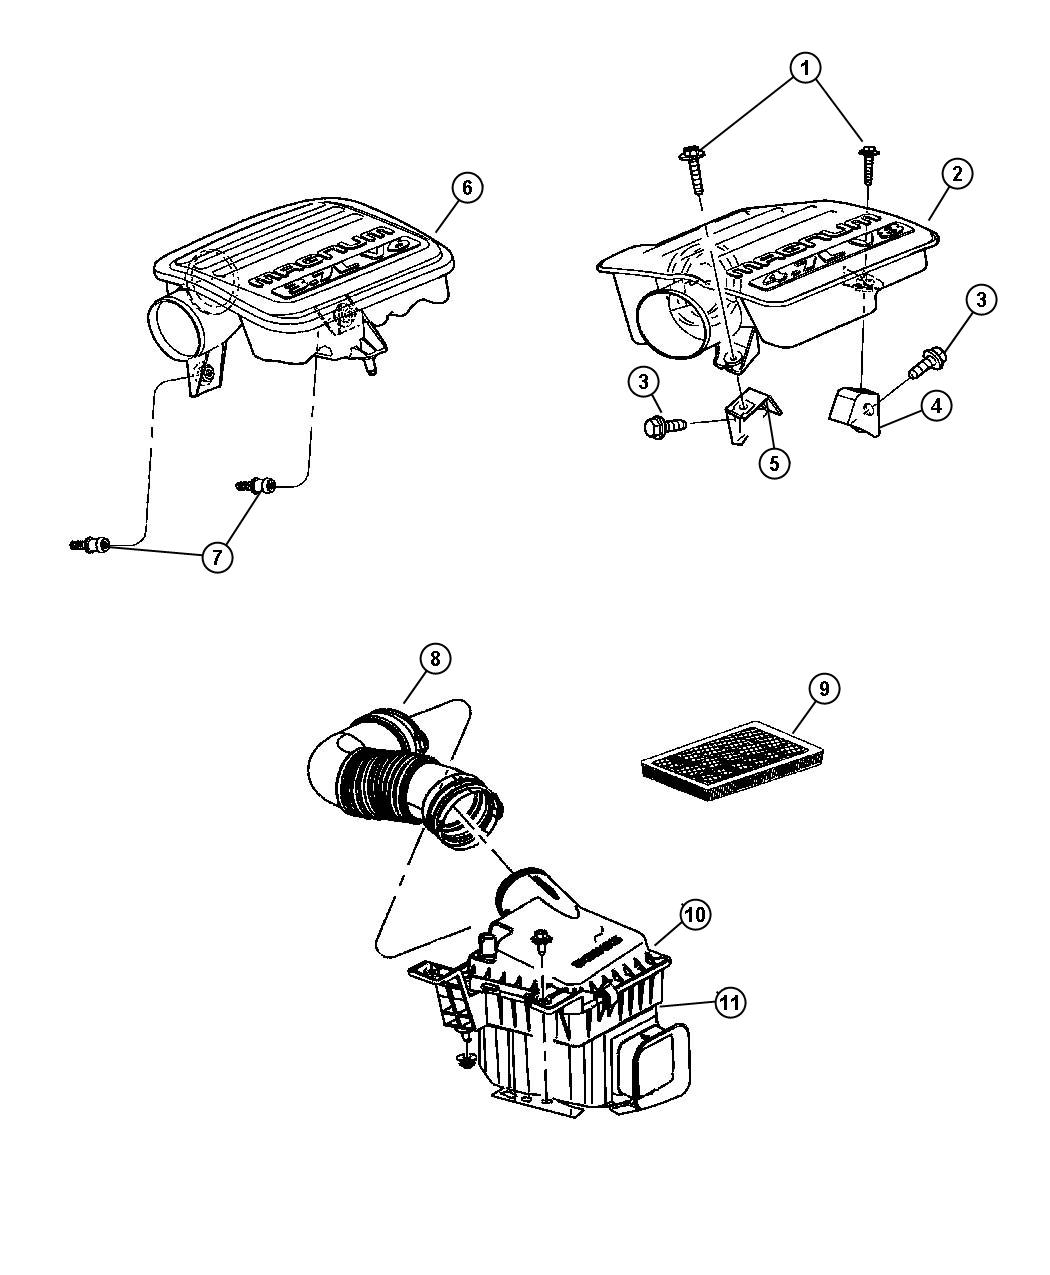 Dodge Durango Element Filter Air Air Cleaner Engine